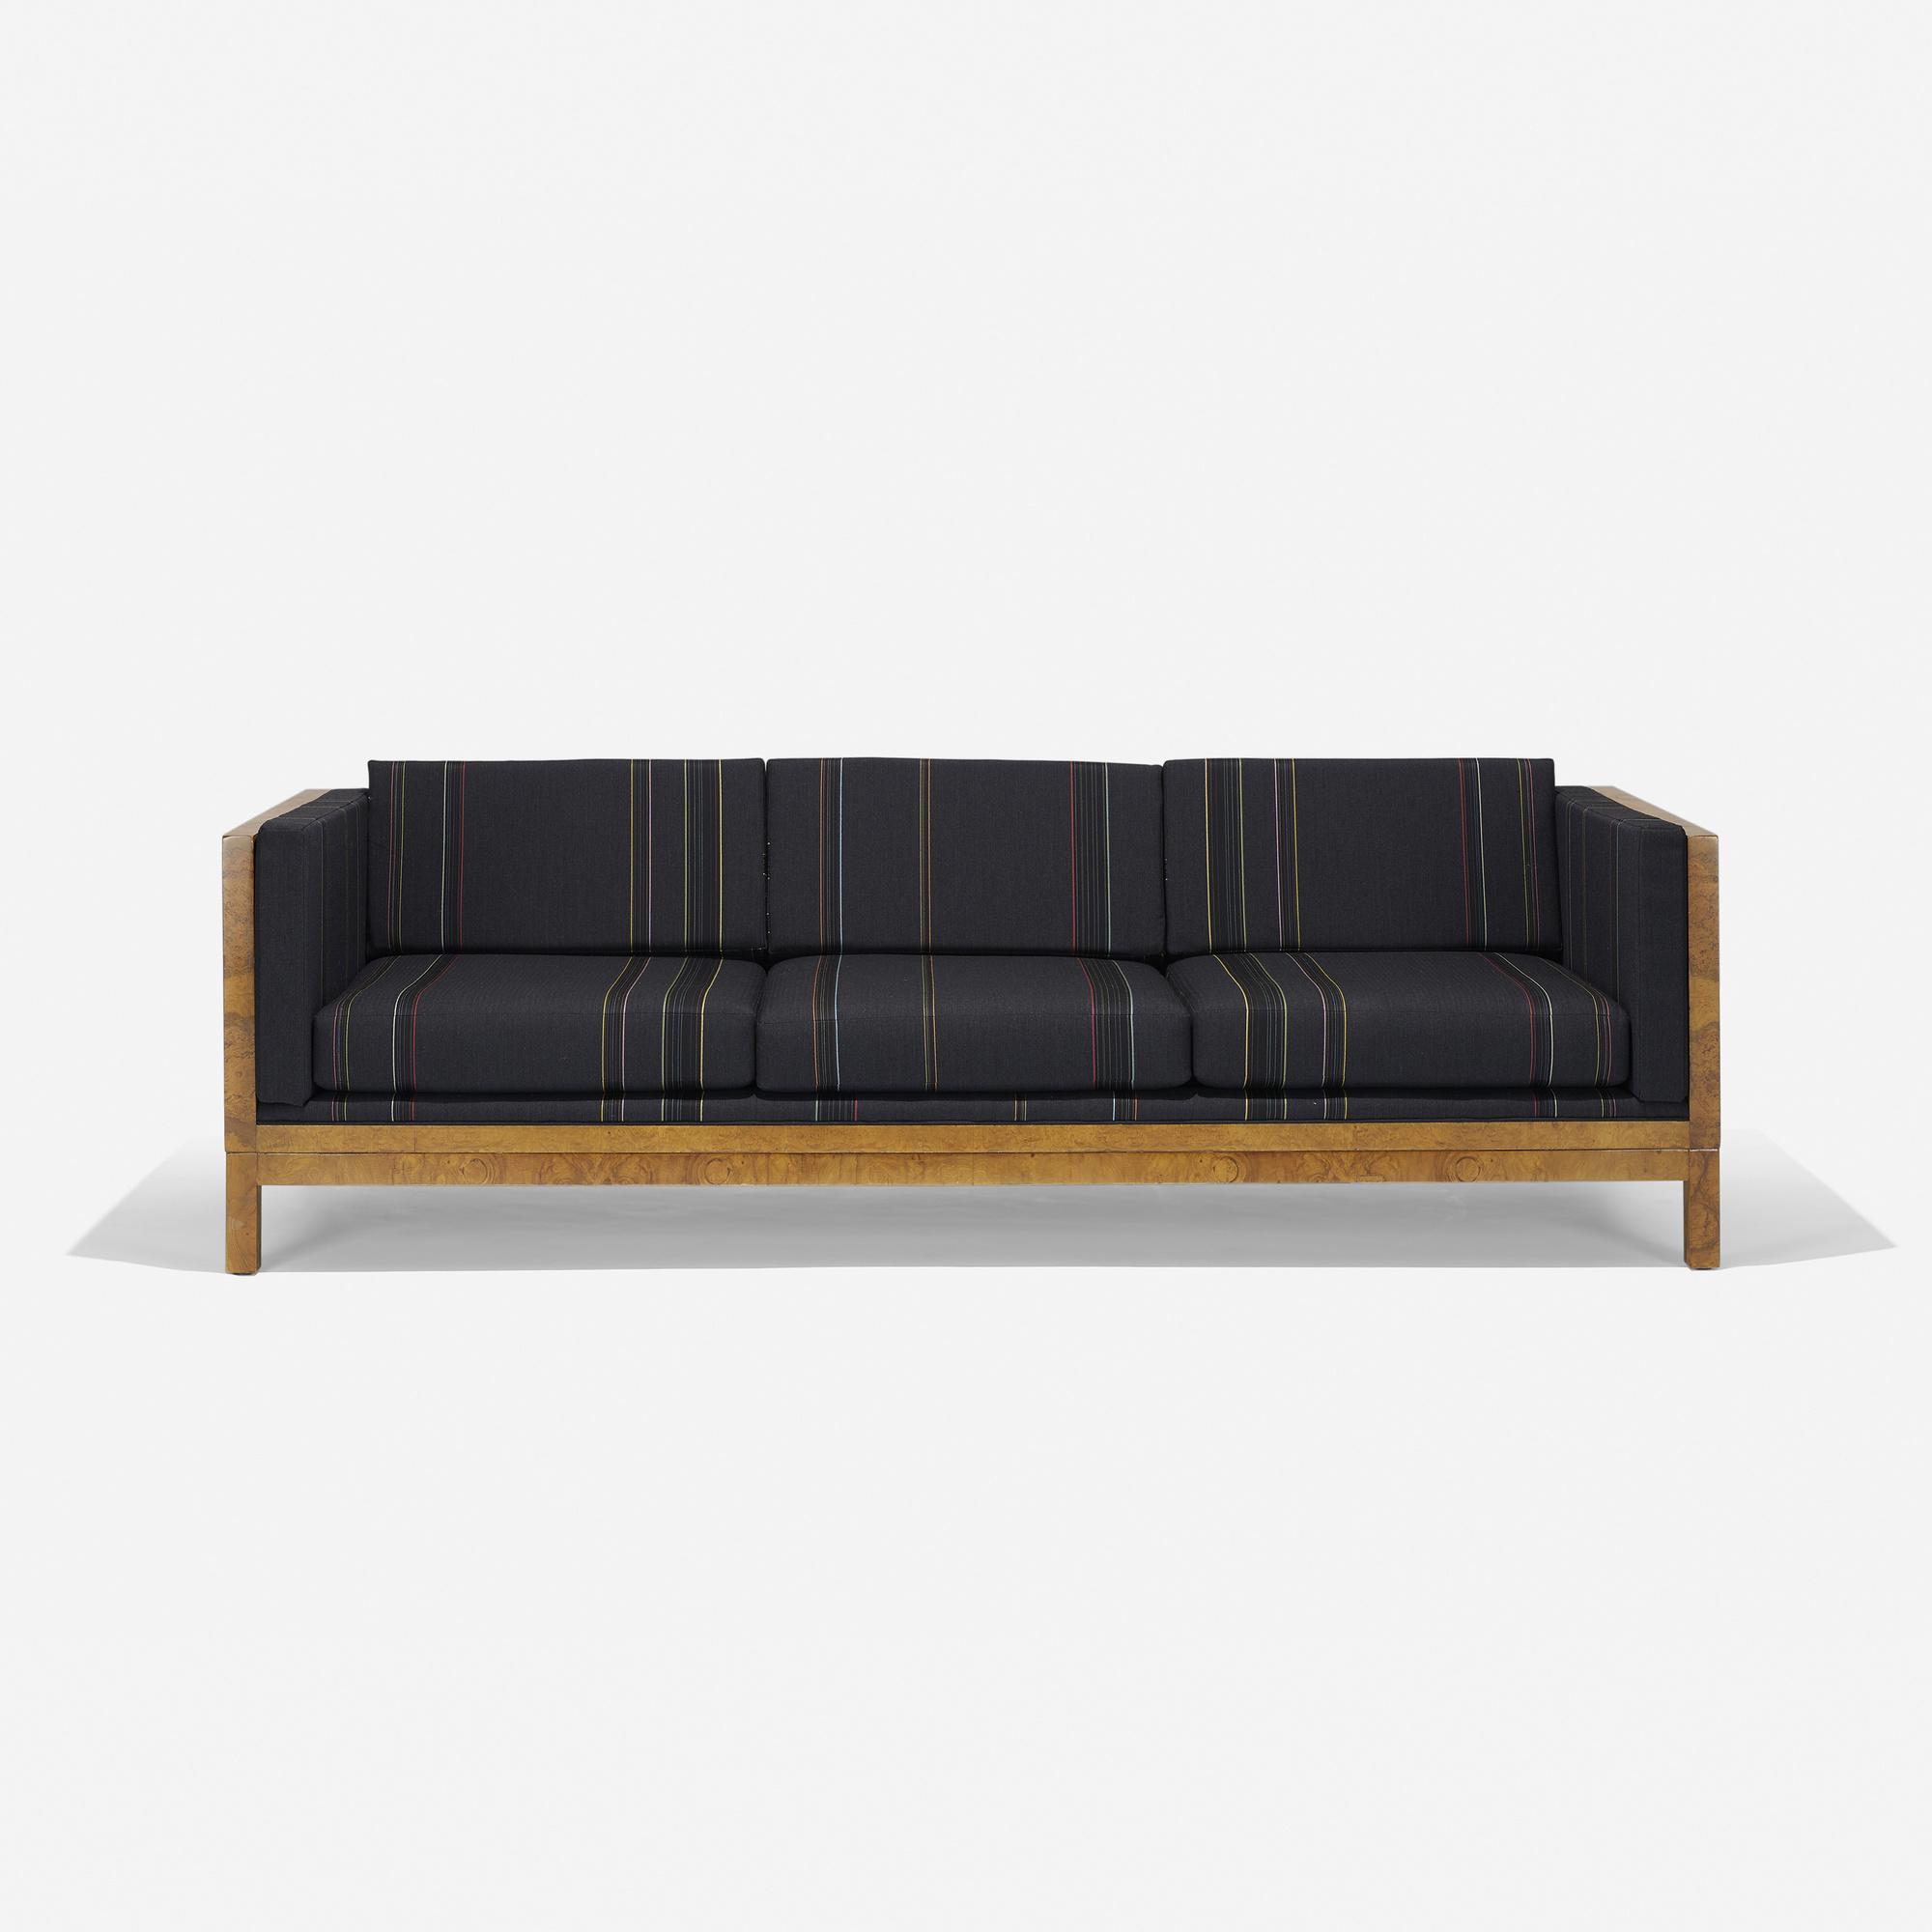 387 Milo Baughman sofa American Design 10 September 2015